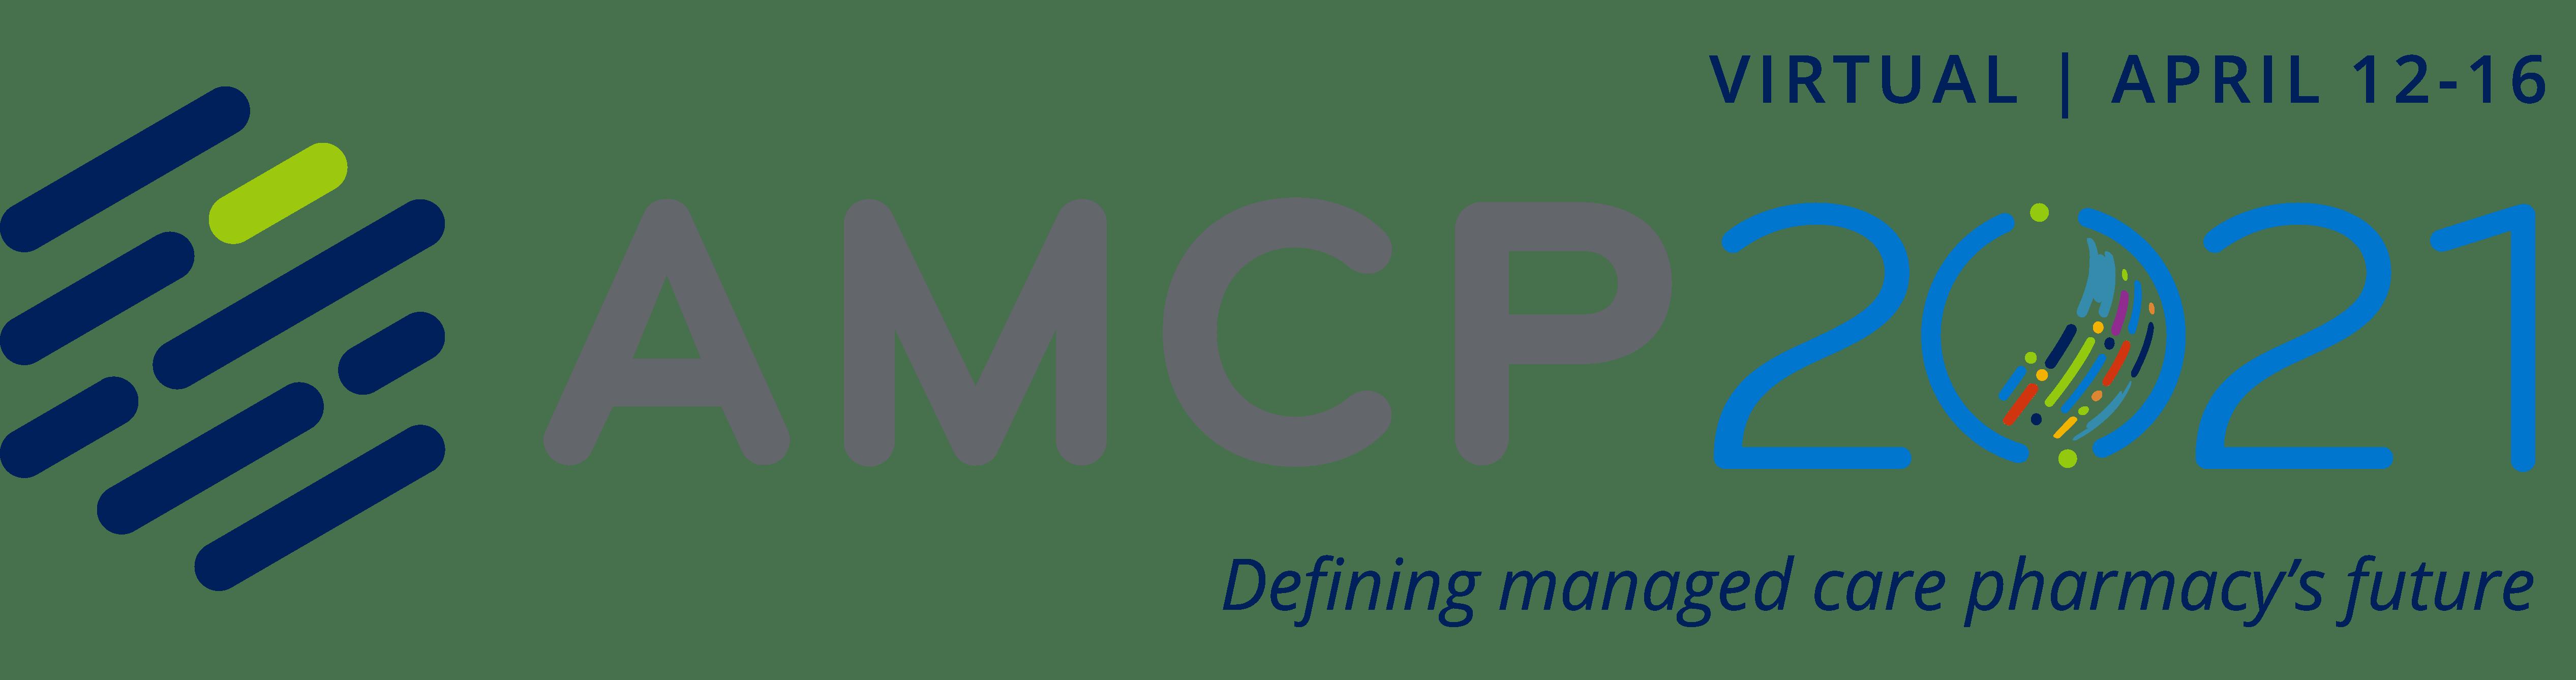 AMCP-2021-Logo-Banner-1